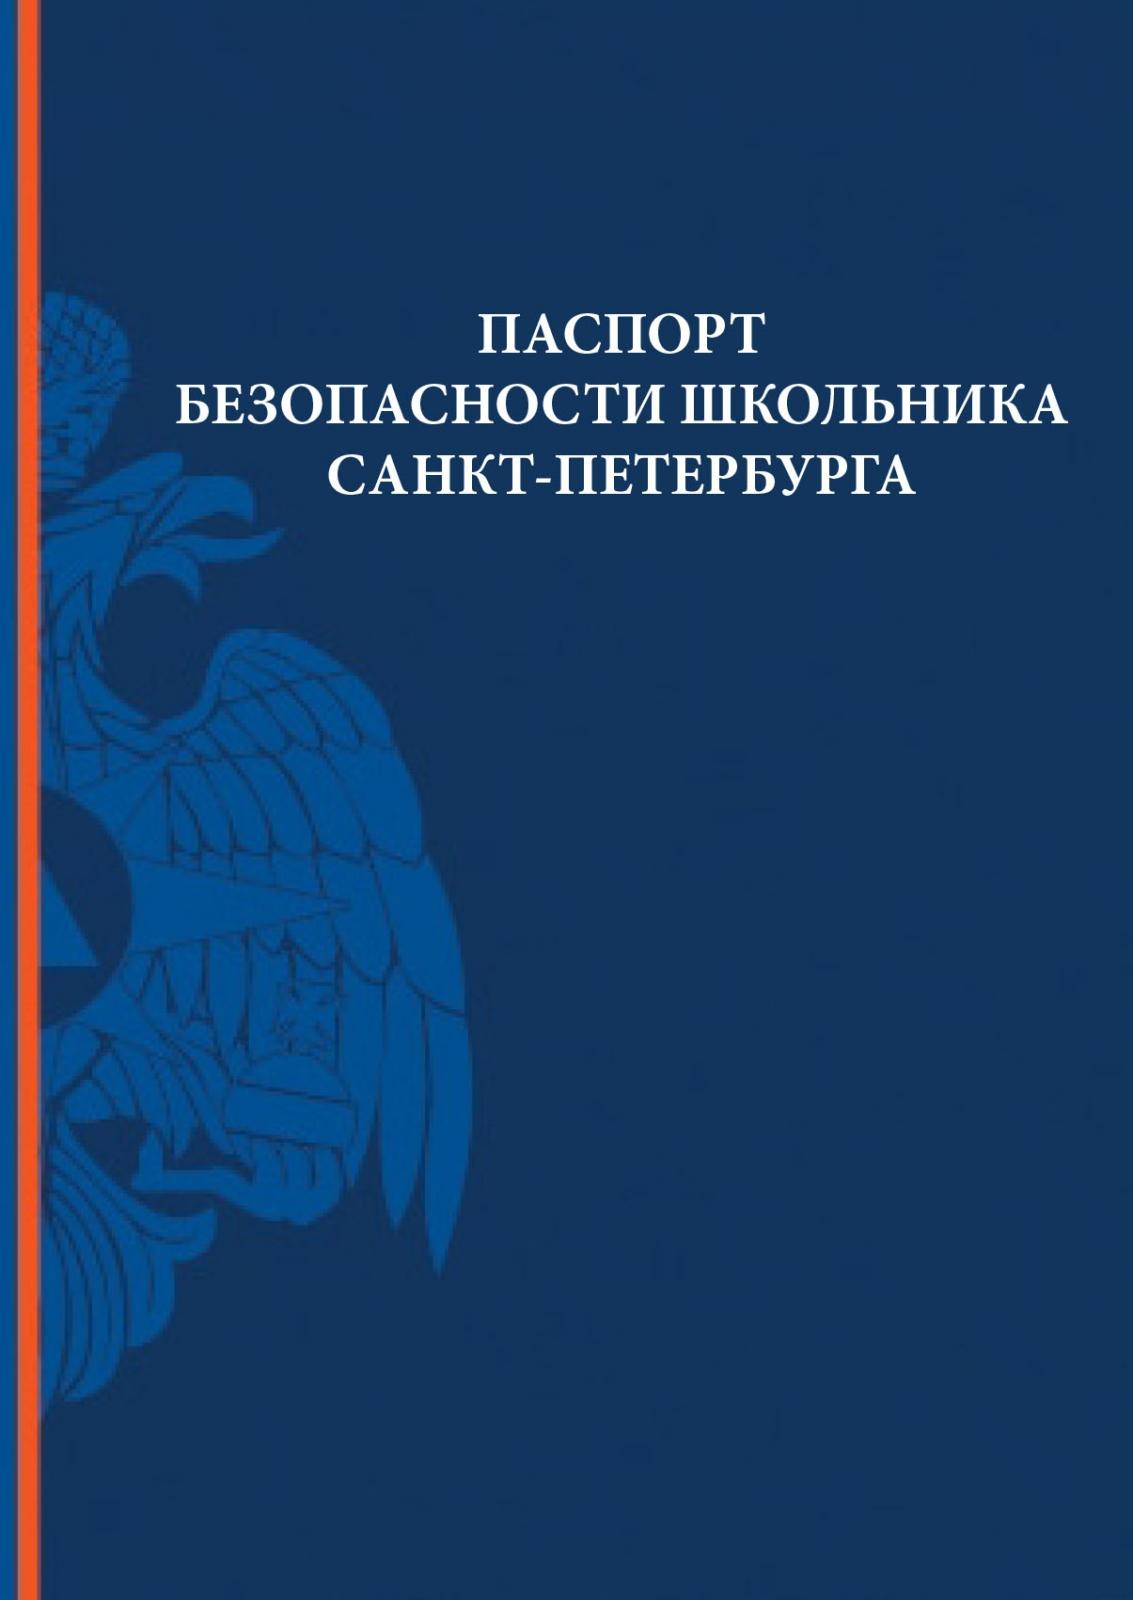 Паспорт безопасности школьника Санкт-Петербурга